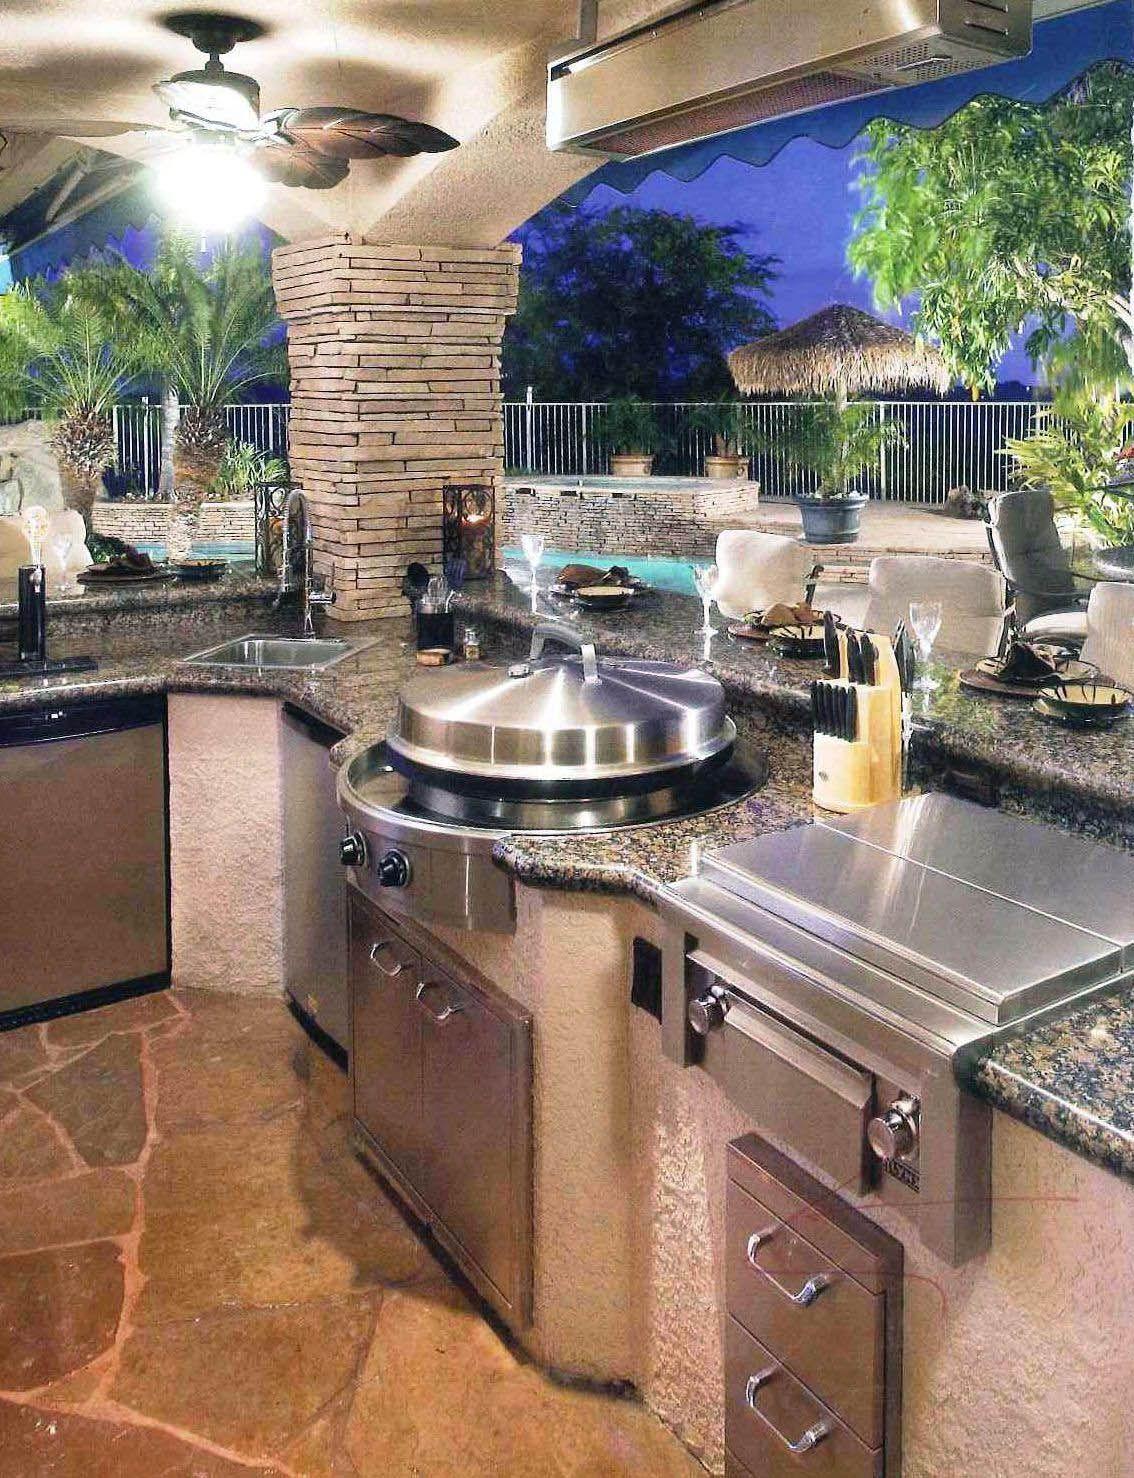 Primary Cajun Outdoor Kitchen Ideas Exclusive On Indoneso Home Decor Outdoor Kitchen Design Outdoor Kitchen Summer Kitchen